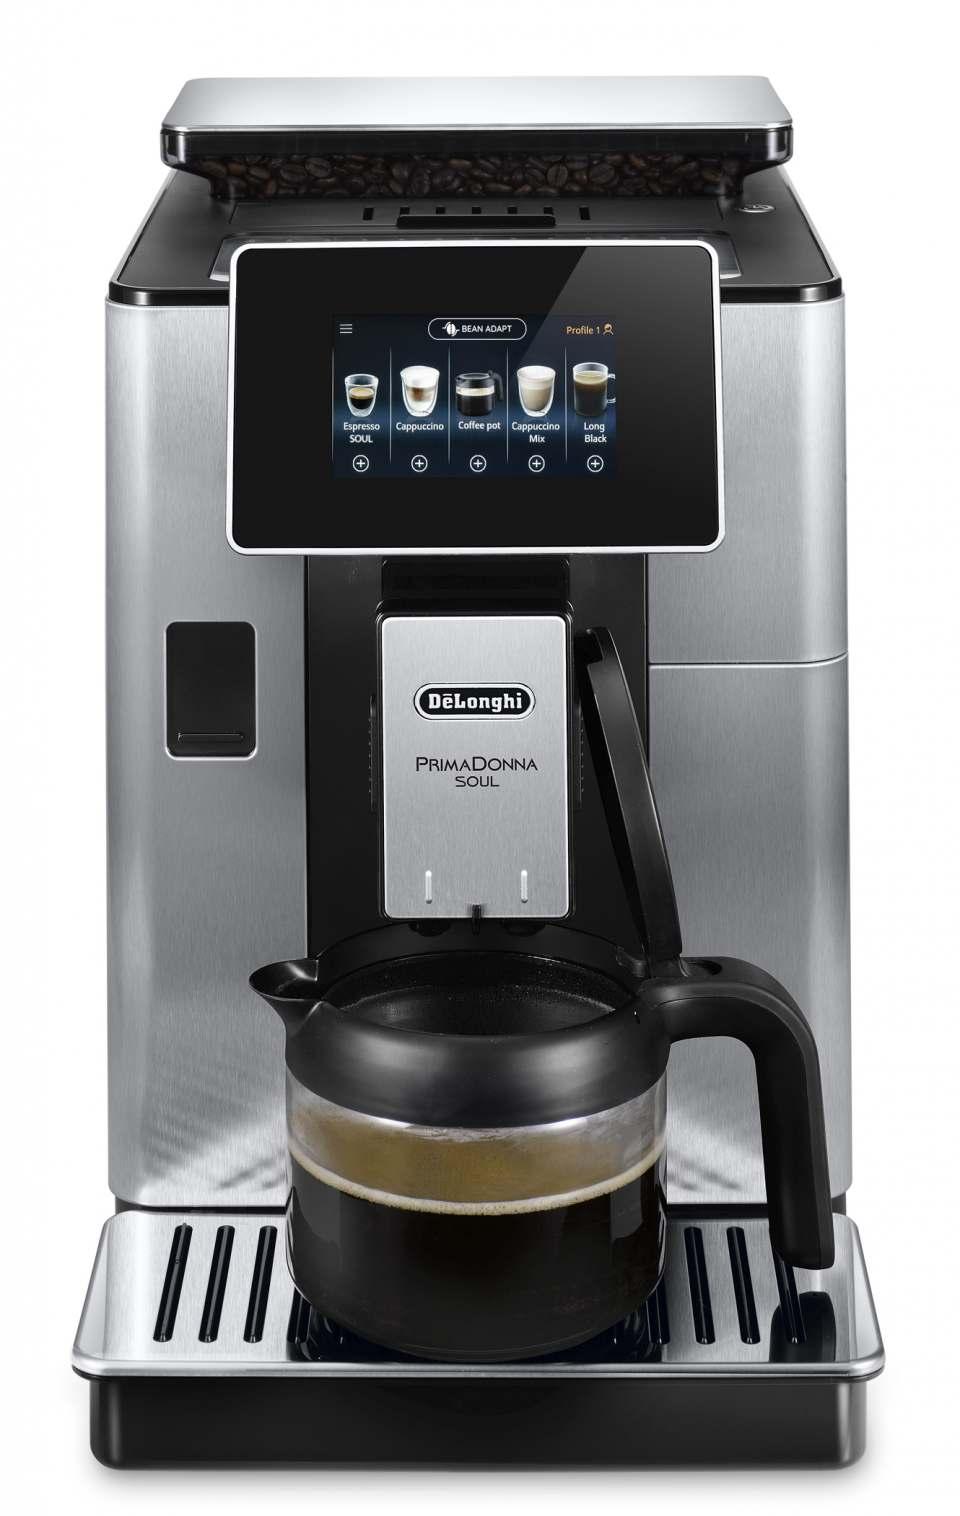 De'Longhi Kaffeevollautomat PrimaDonna Soul mit Bean Adapt.